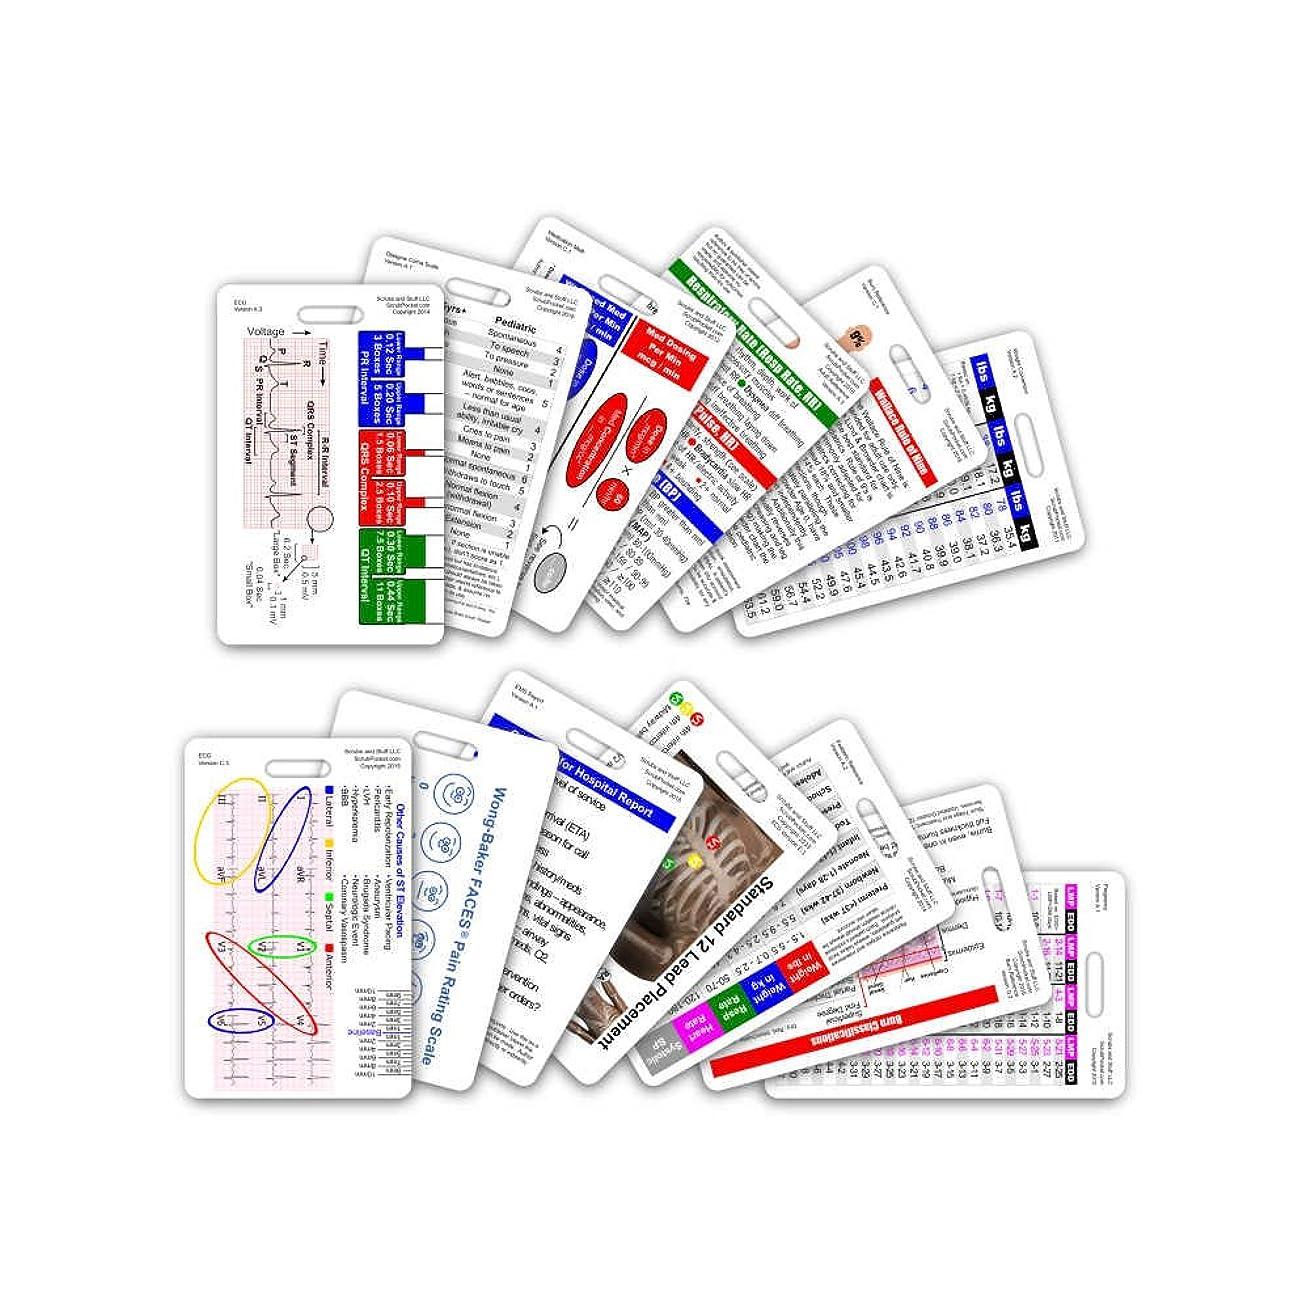 船尾不条理異邦人Complete EMS Vertical Badge Card Set - 12 Cards by Scrubs and Stuff LLC